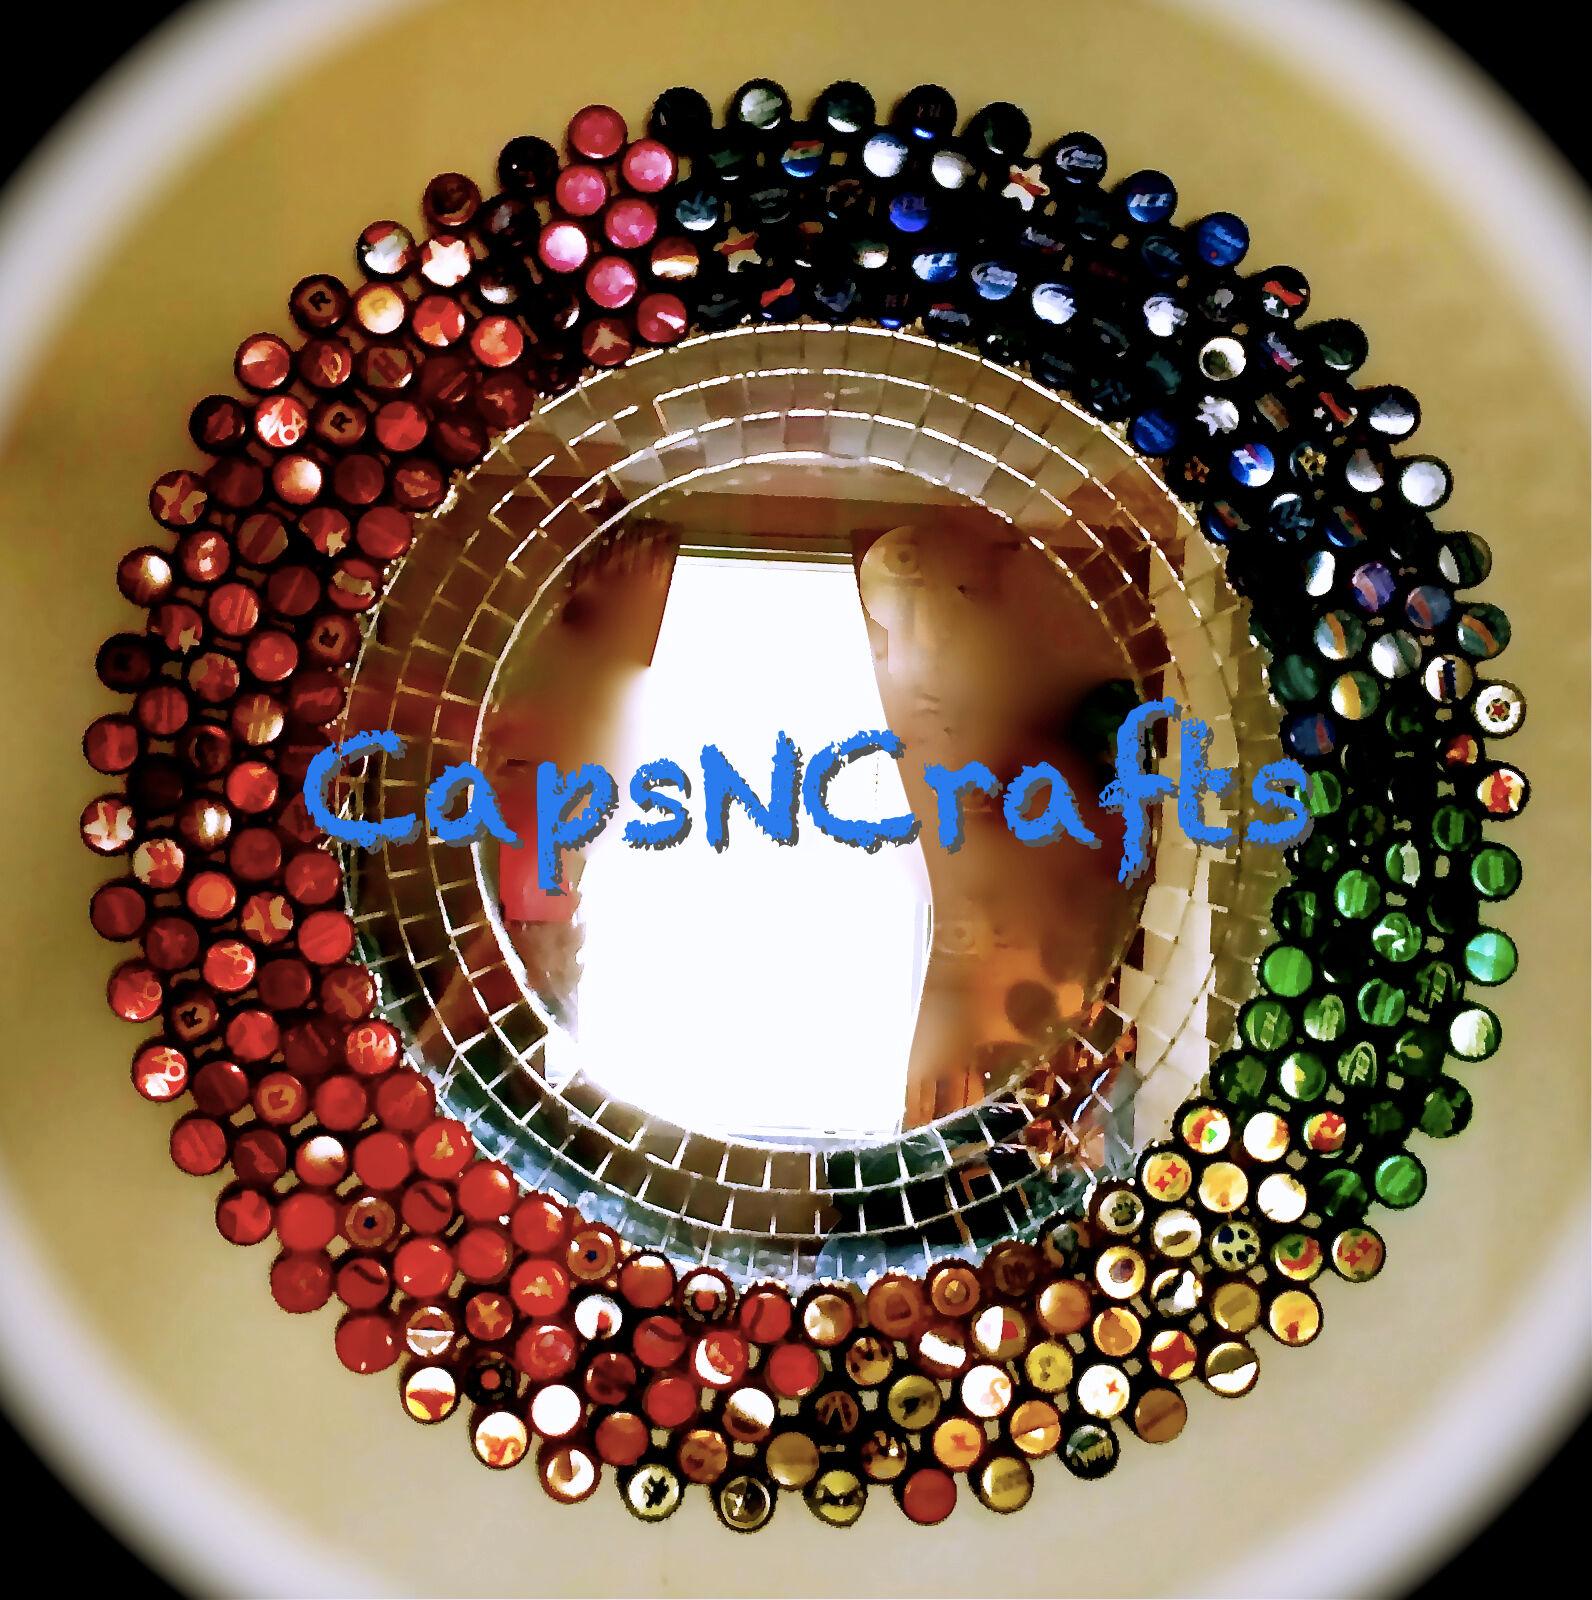 CapsNCrafts